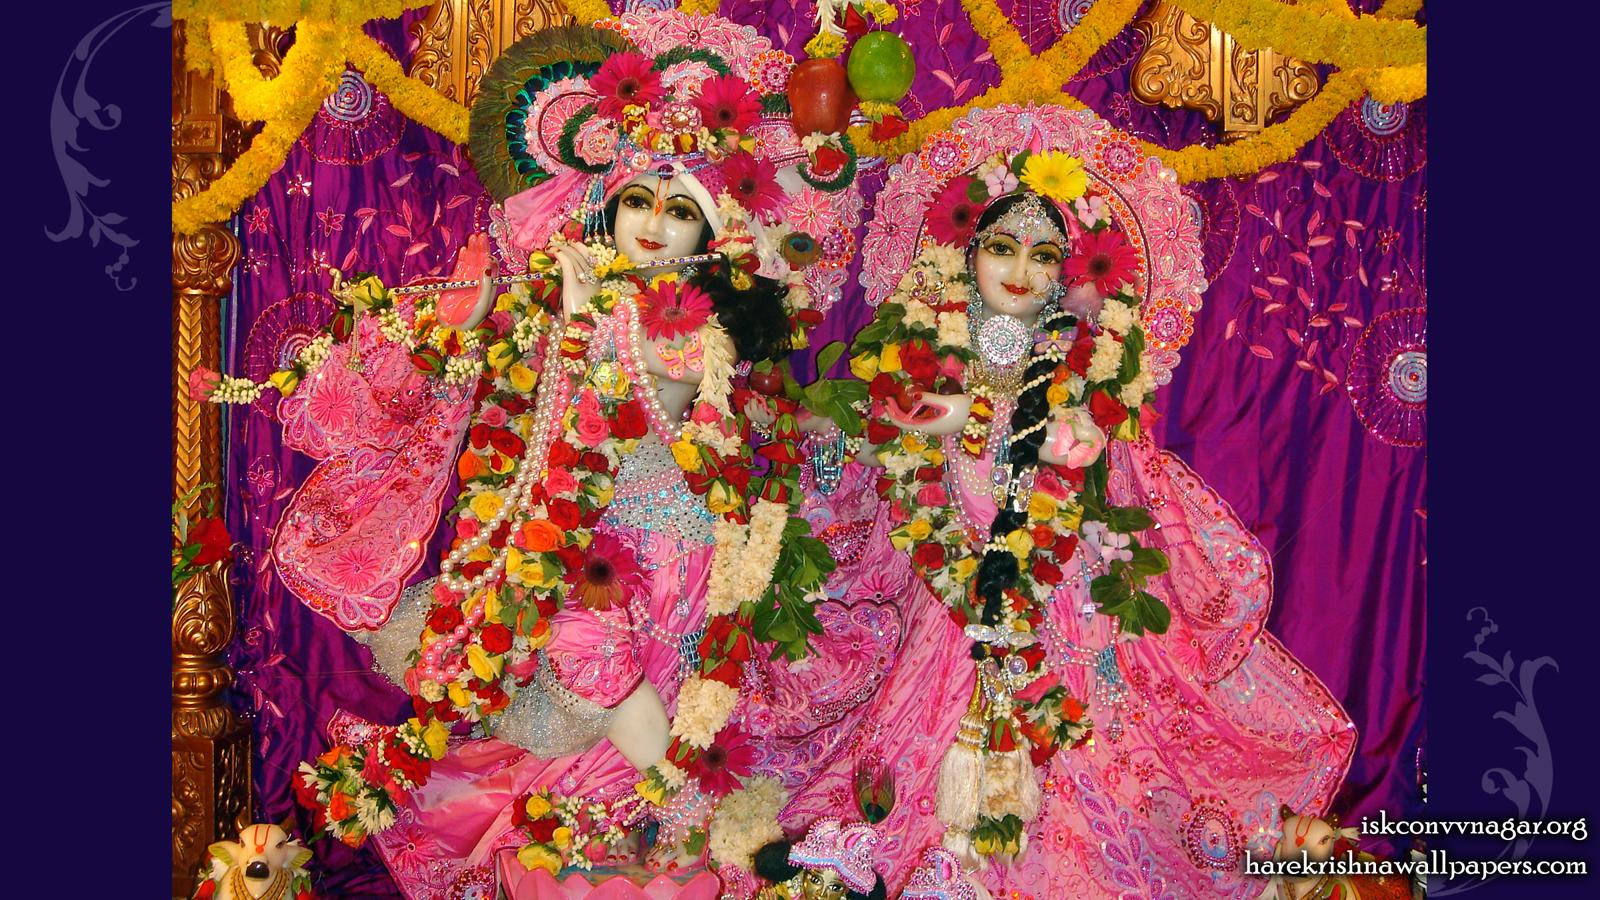 Sri Sri Radha Giridhari Wallpaper (002) Size 1600x900 Download